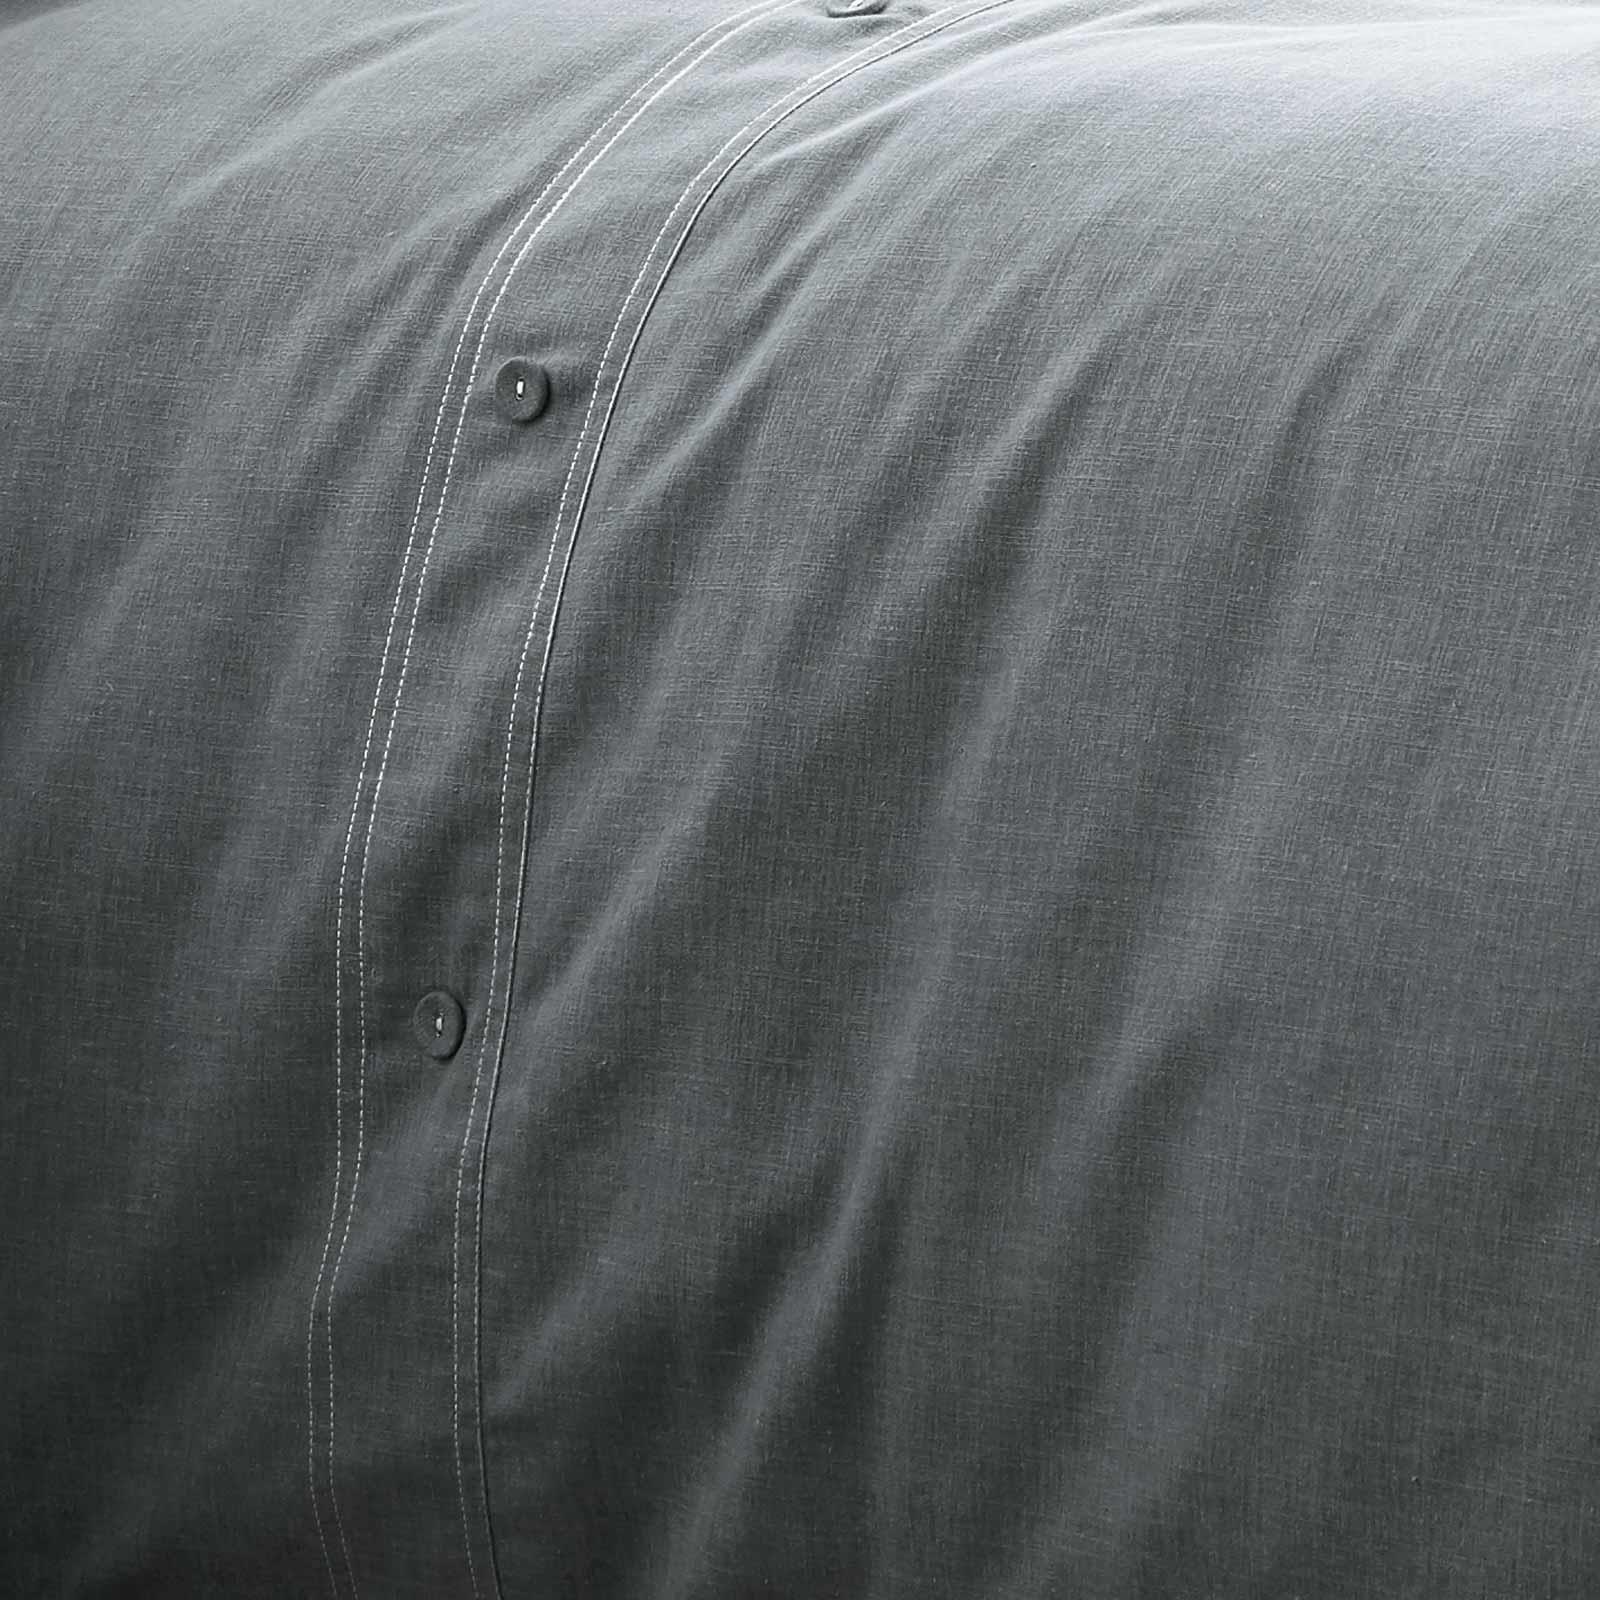 Azul-fundas-nordicas-Denim-Chambray-Boton-Detalle-de-lujo-cubierta-del-edredon-conjuntos-de-cama miniatura 3